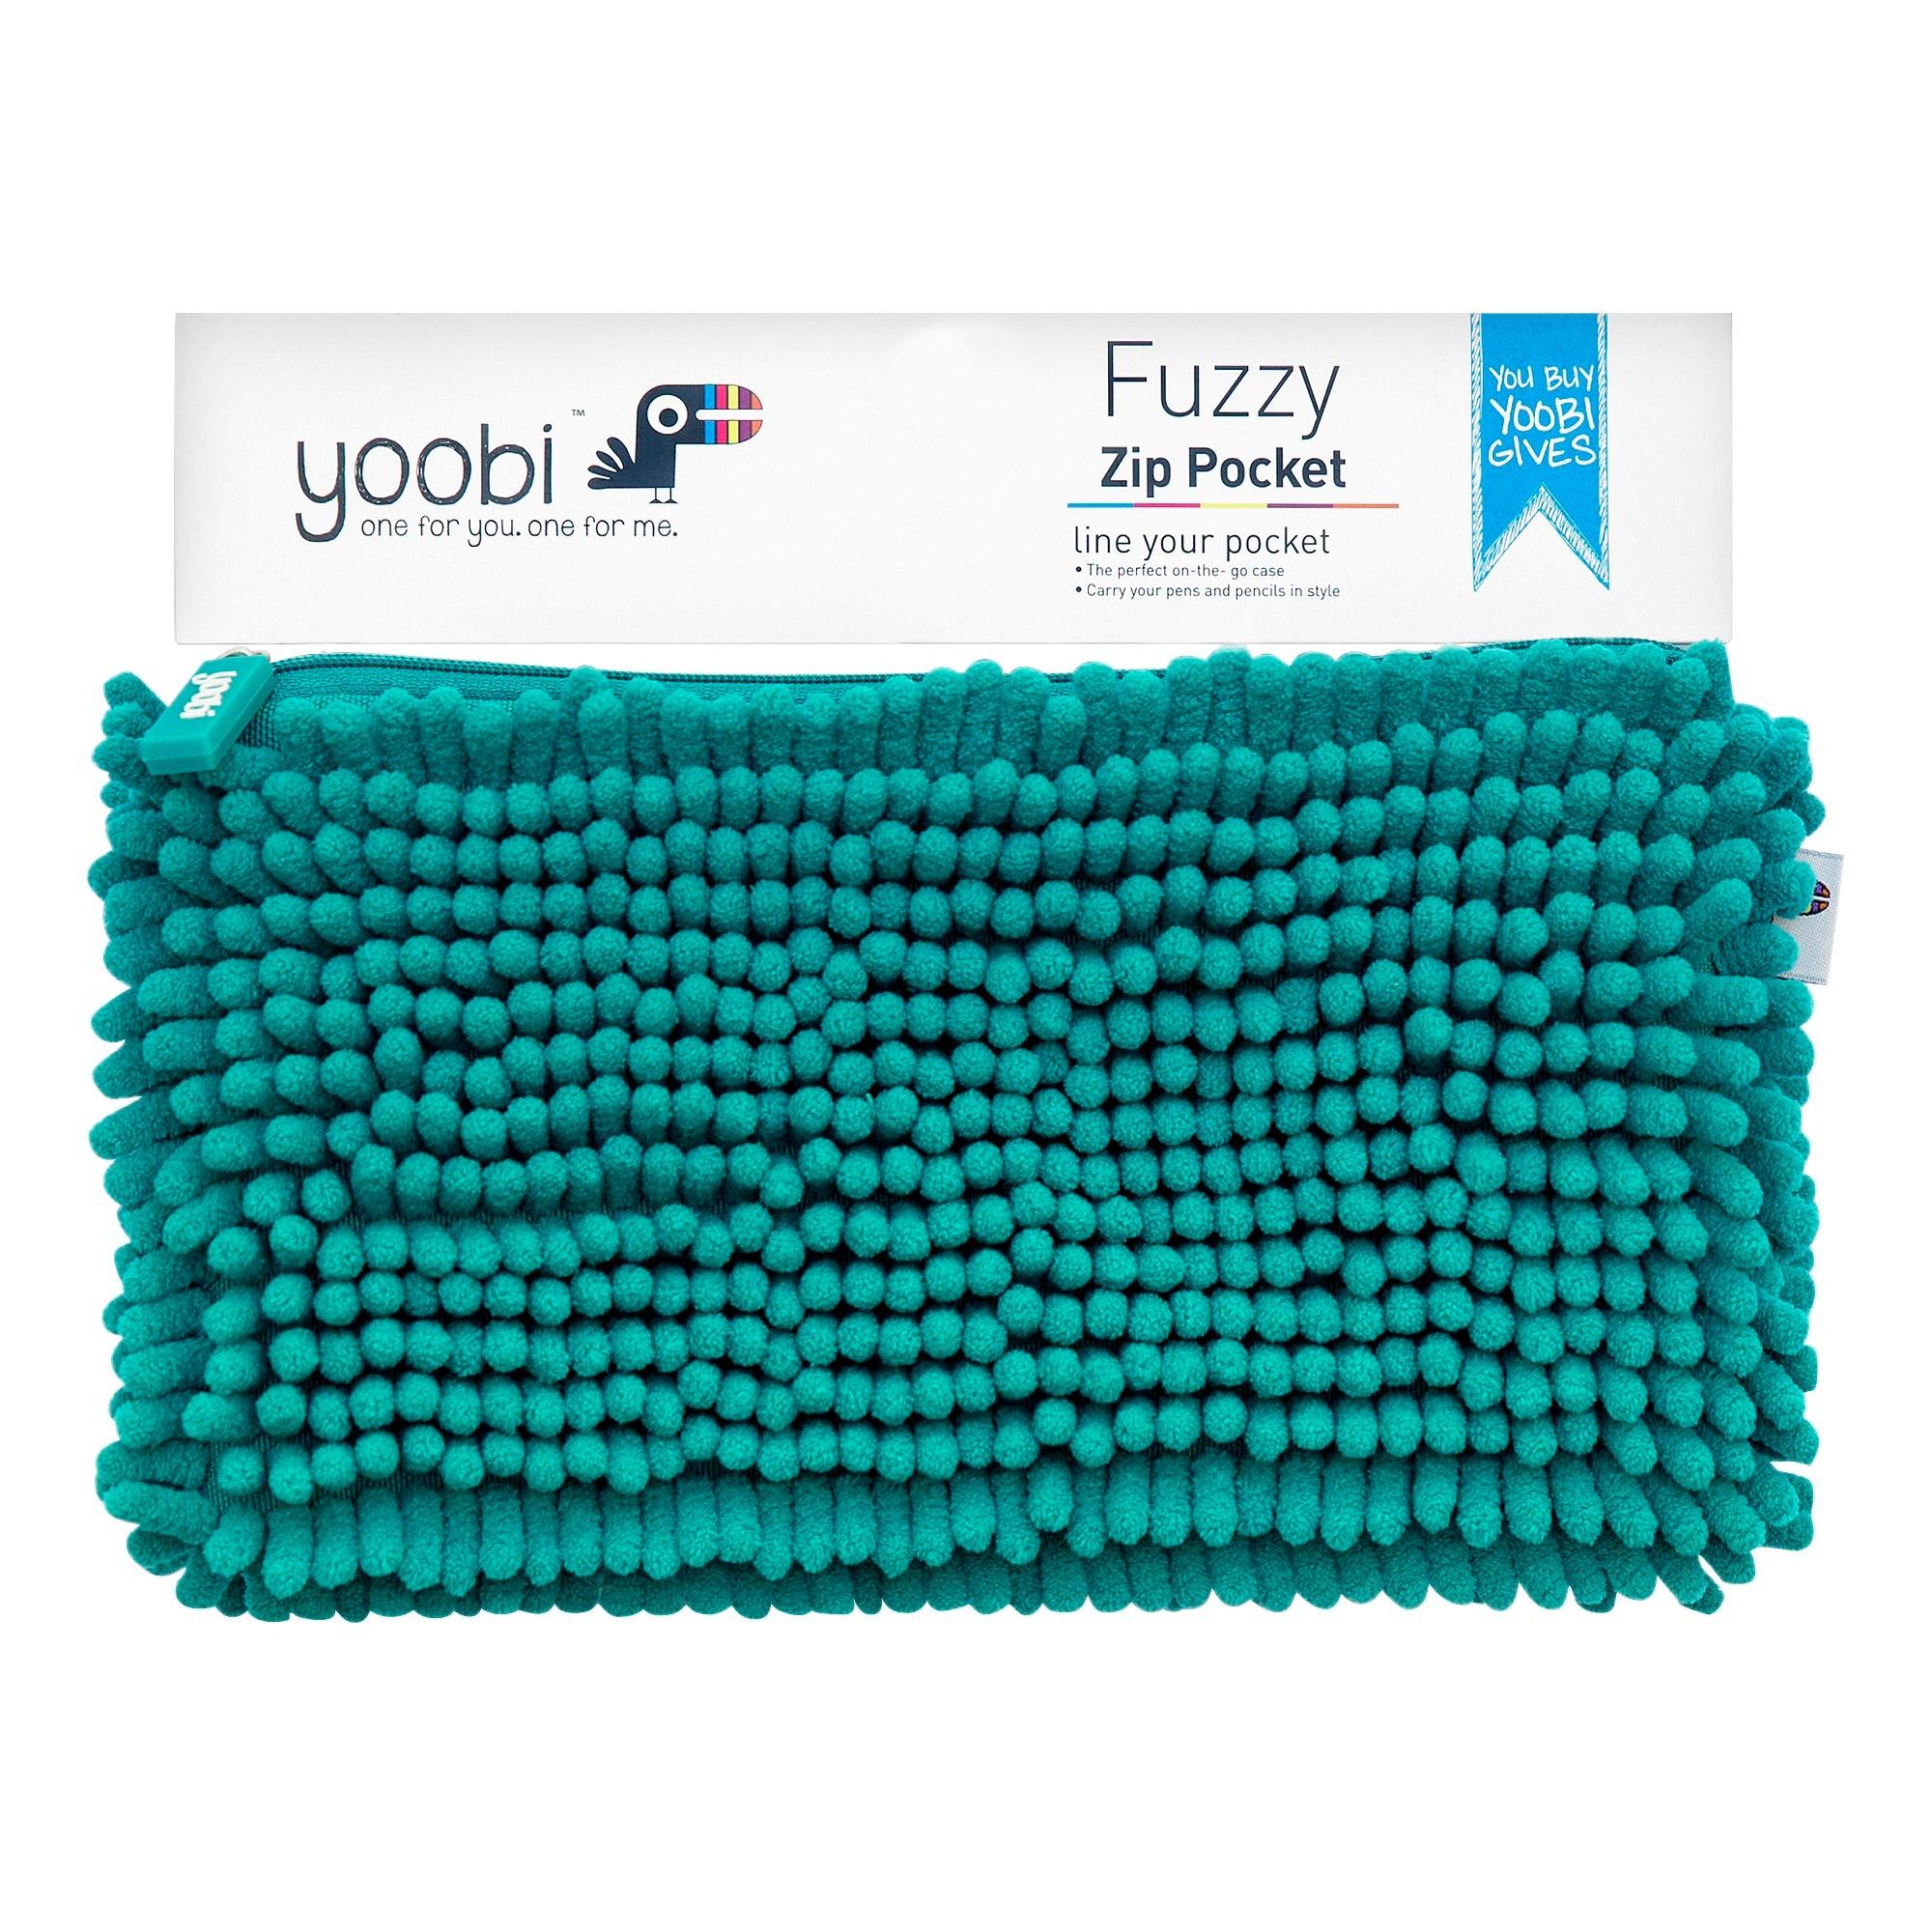 Yoobi Fuzzy Pocket Pencil Case Aqua Purple Products School